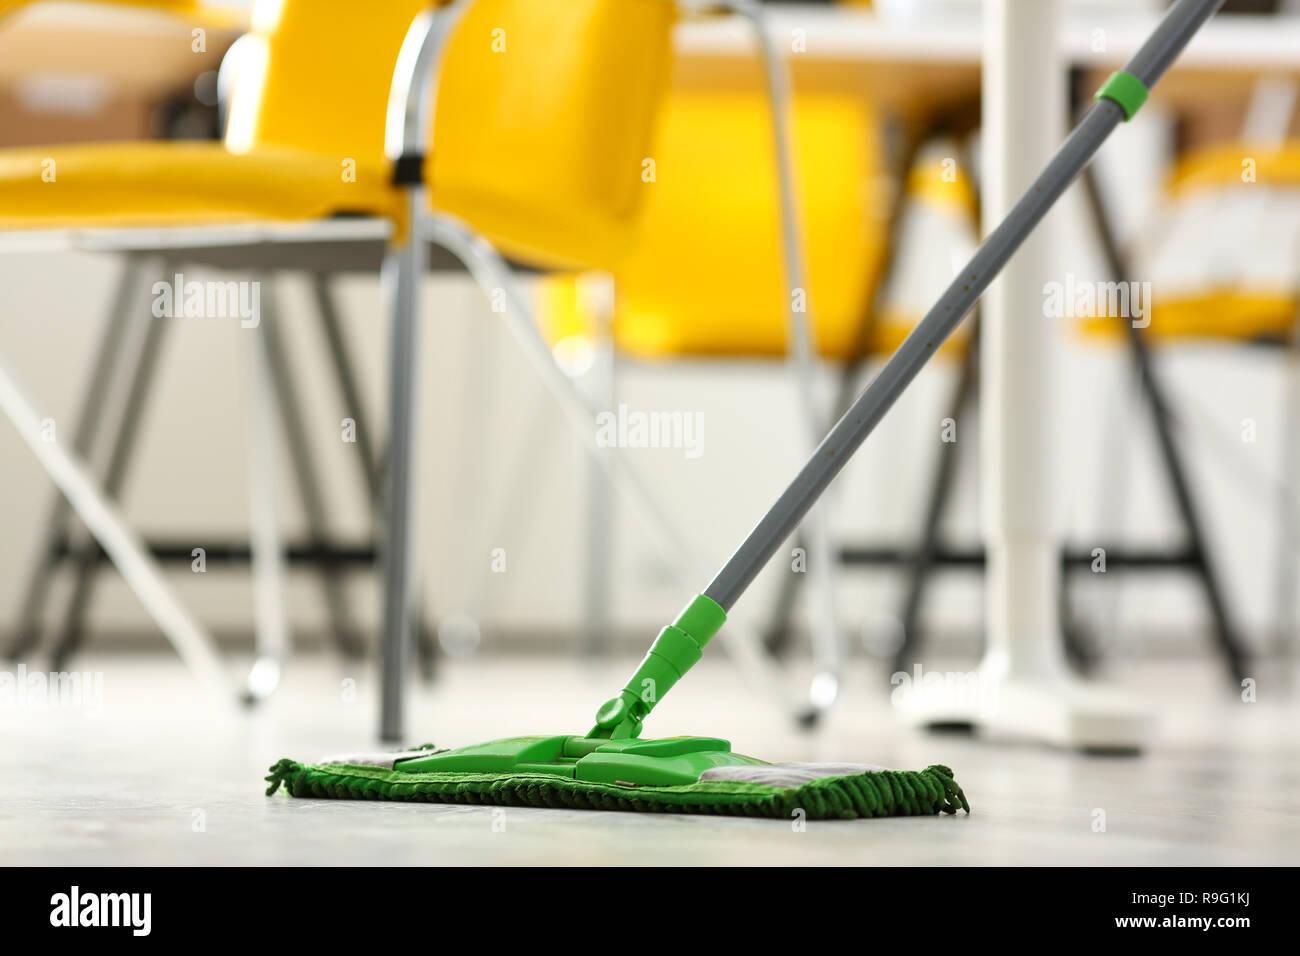 Green plastic mop - Stock Image